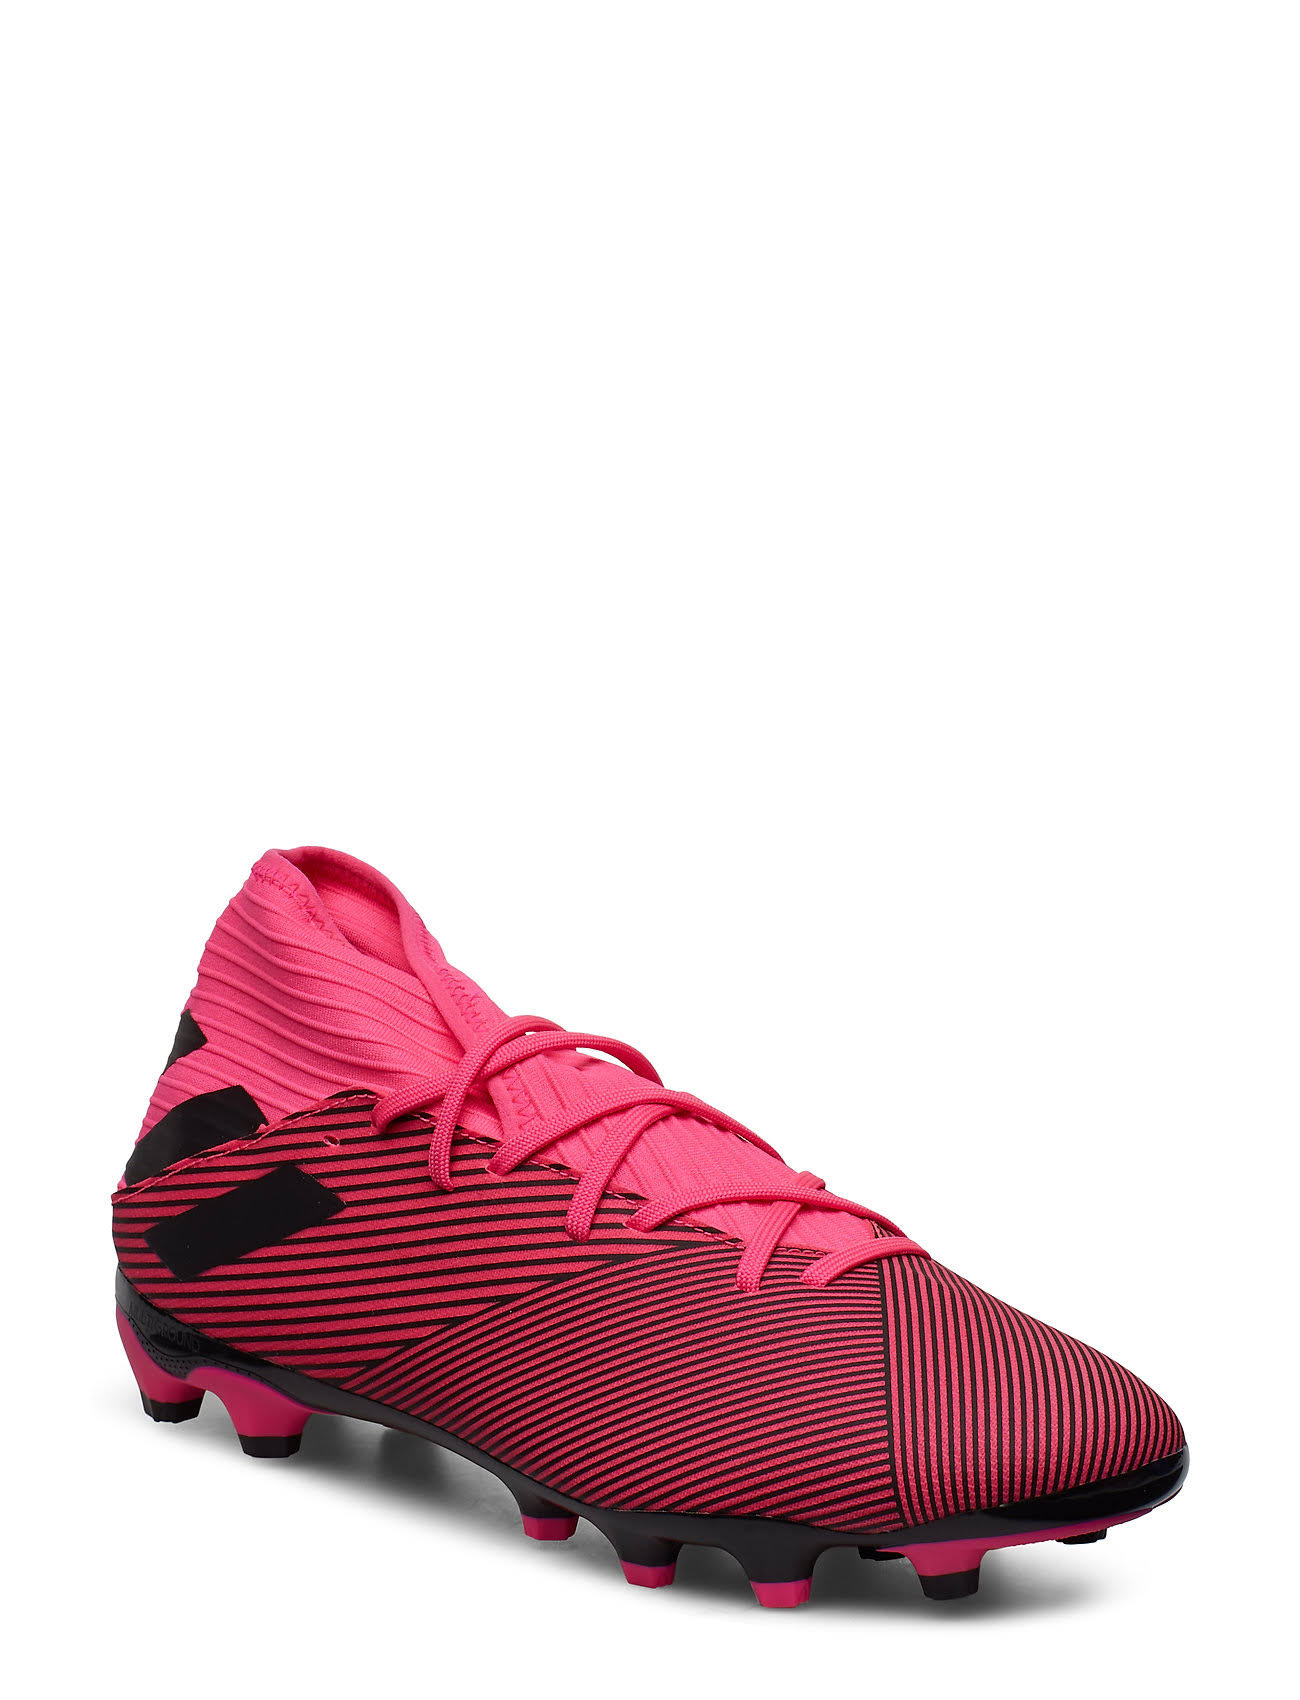 Adidas Performance Nemeziz 19.3 Mg Shopnk/Cblack/Shopnk 45 1/3 Men > Shoes